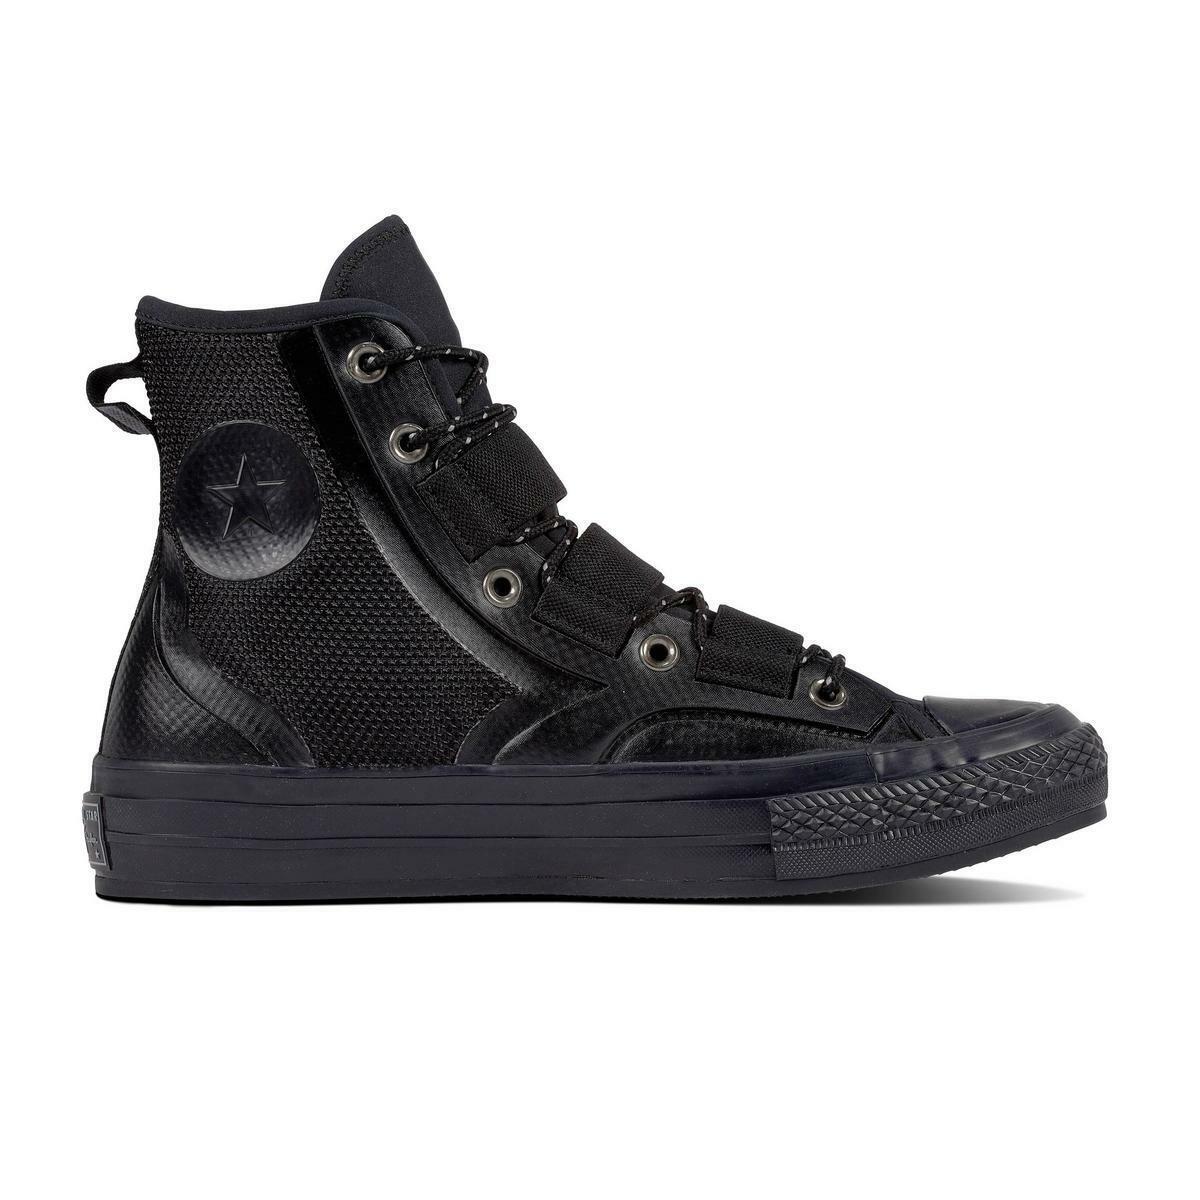 NIB Men's Converse CT70 TECH HIKER  High-Top Sneakers Multiple colors